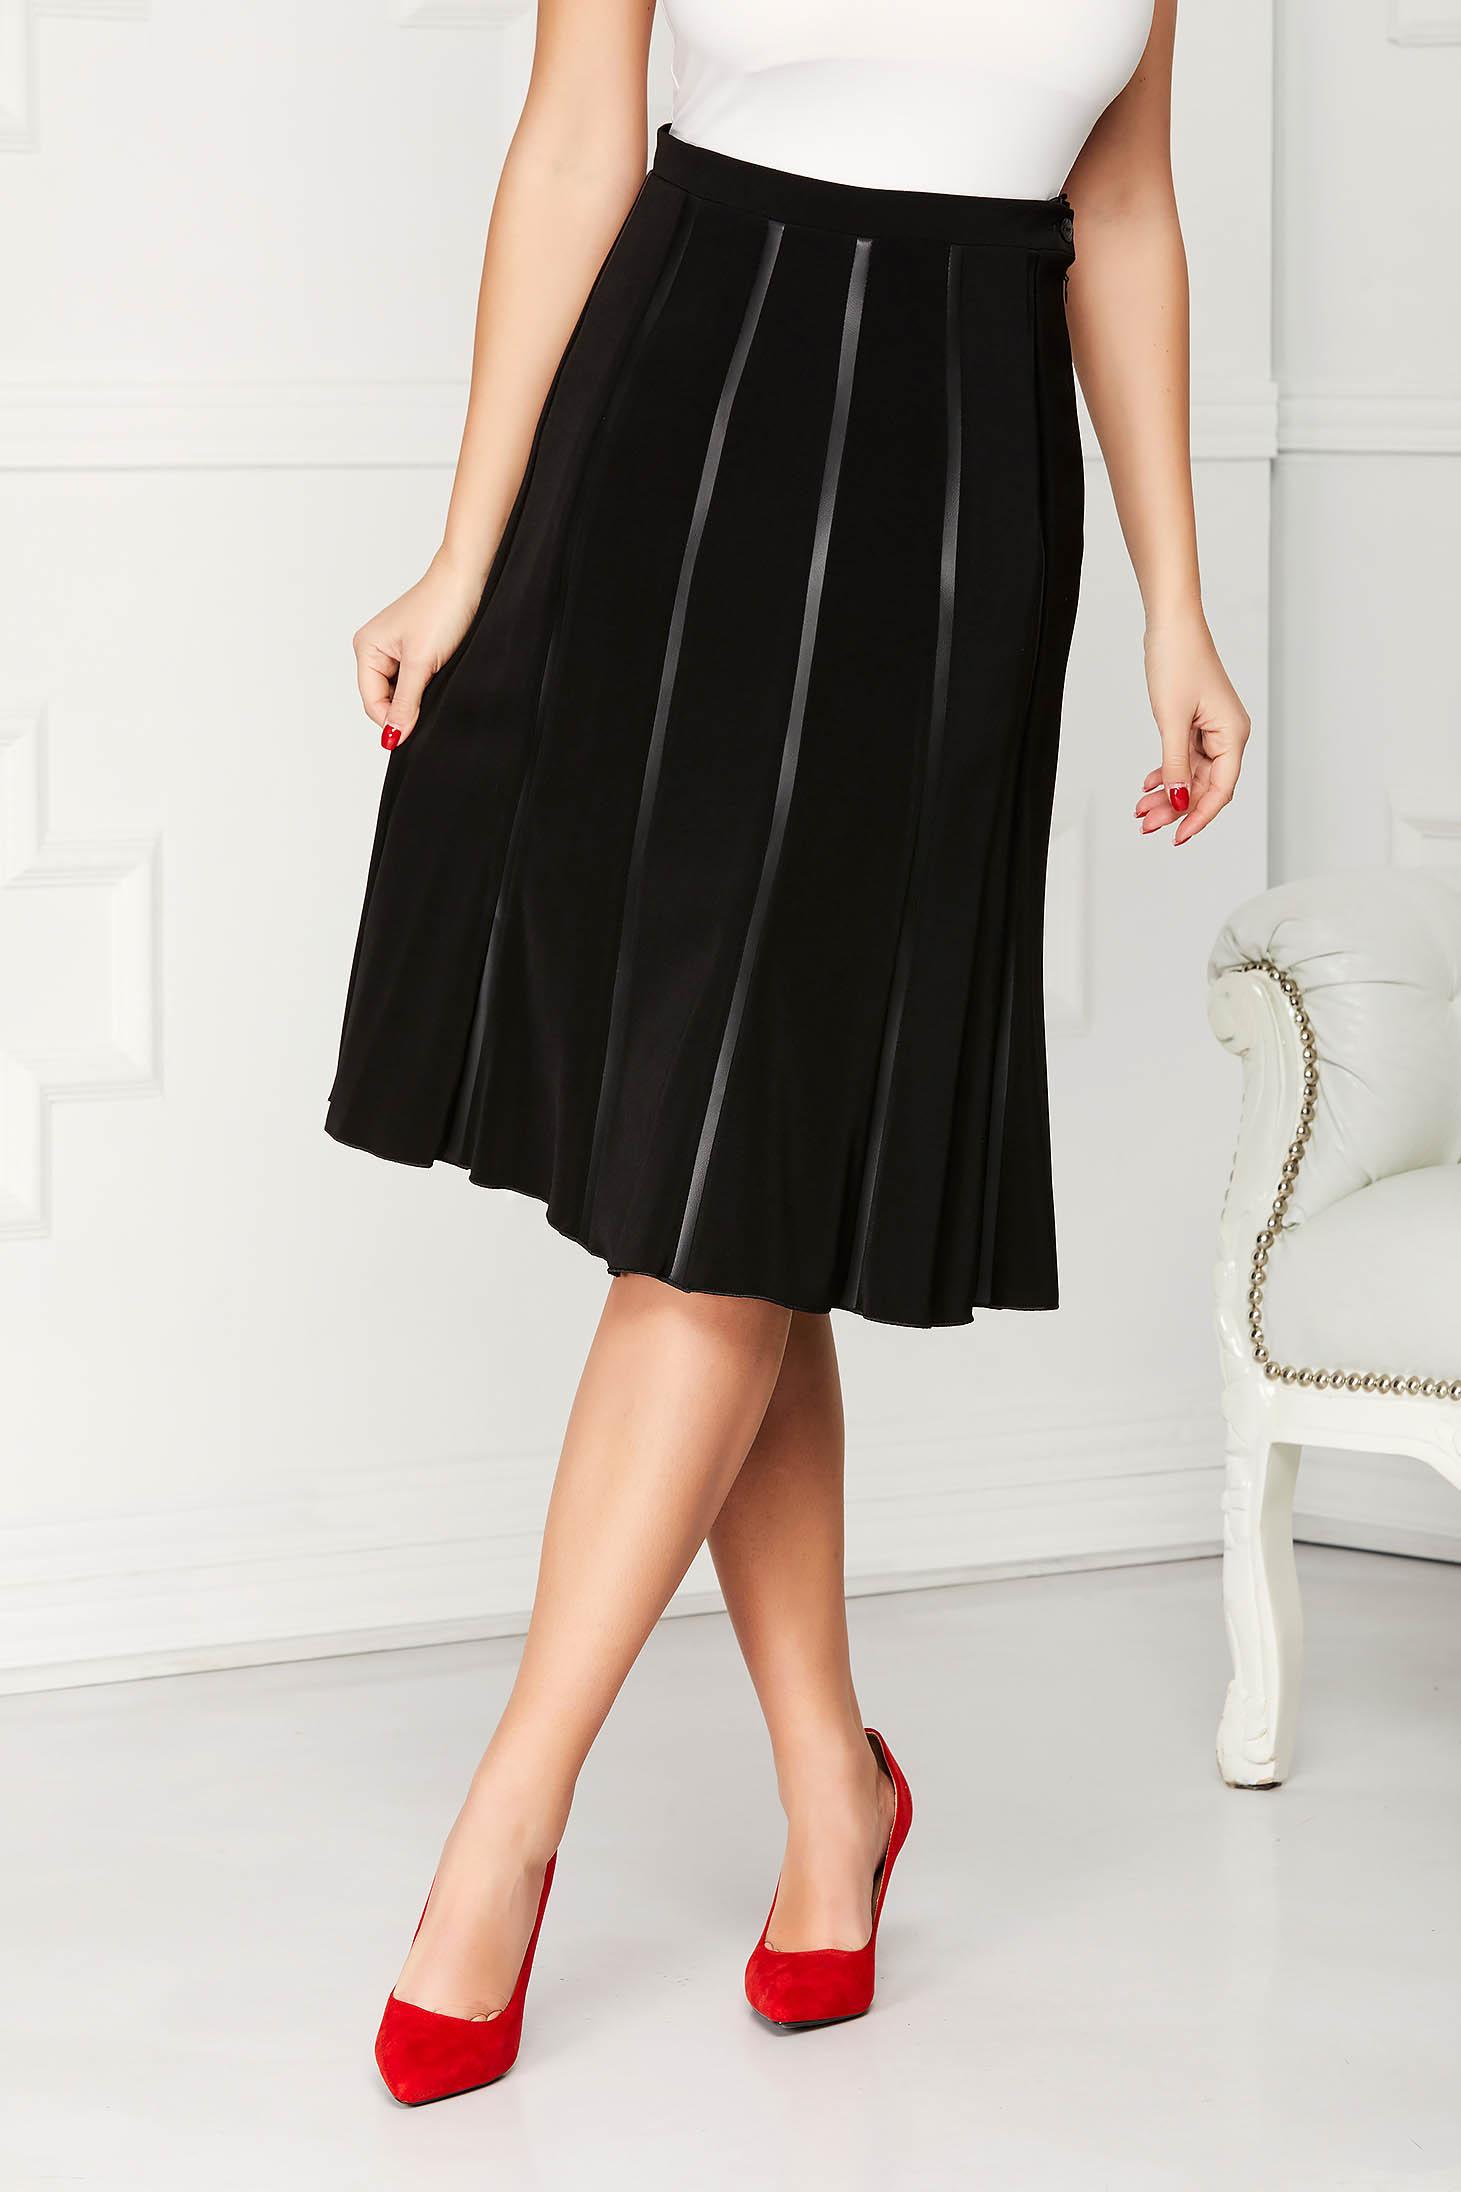 Black skirt elegant midi straight high waisted pleats of material cloth